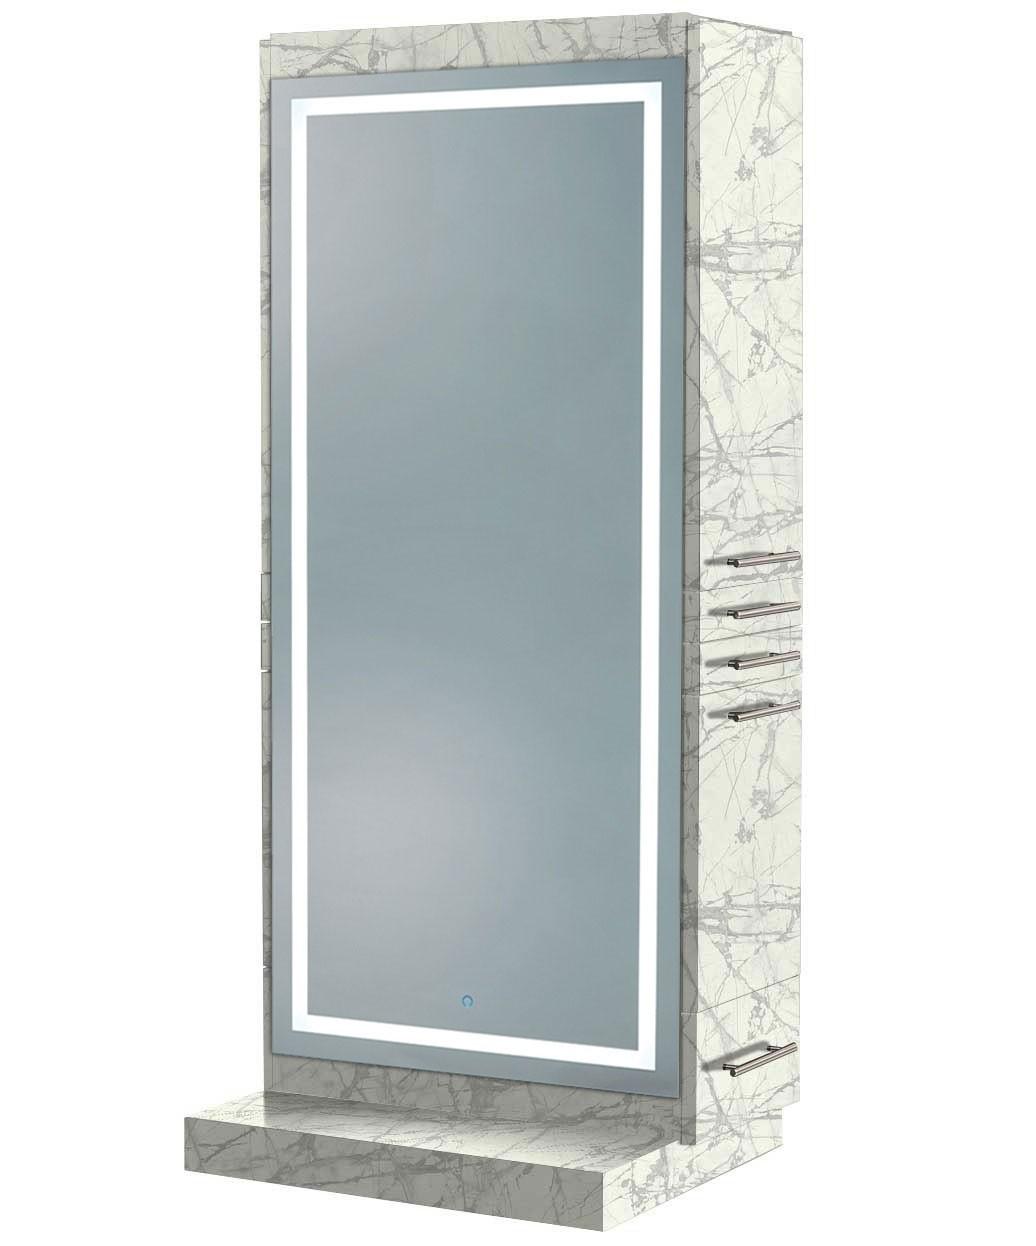 Zeus Styling Station w/ Mobile Base & LED Mirror